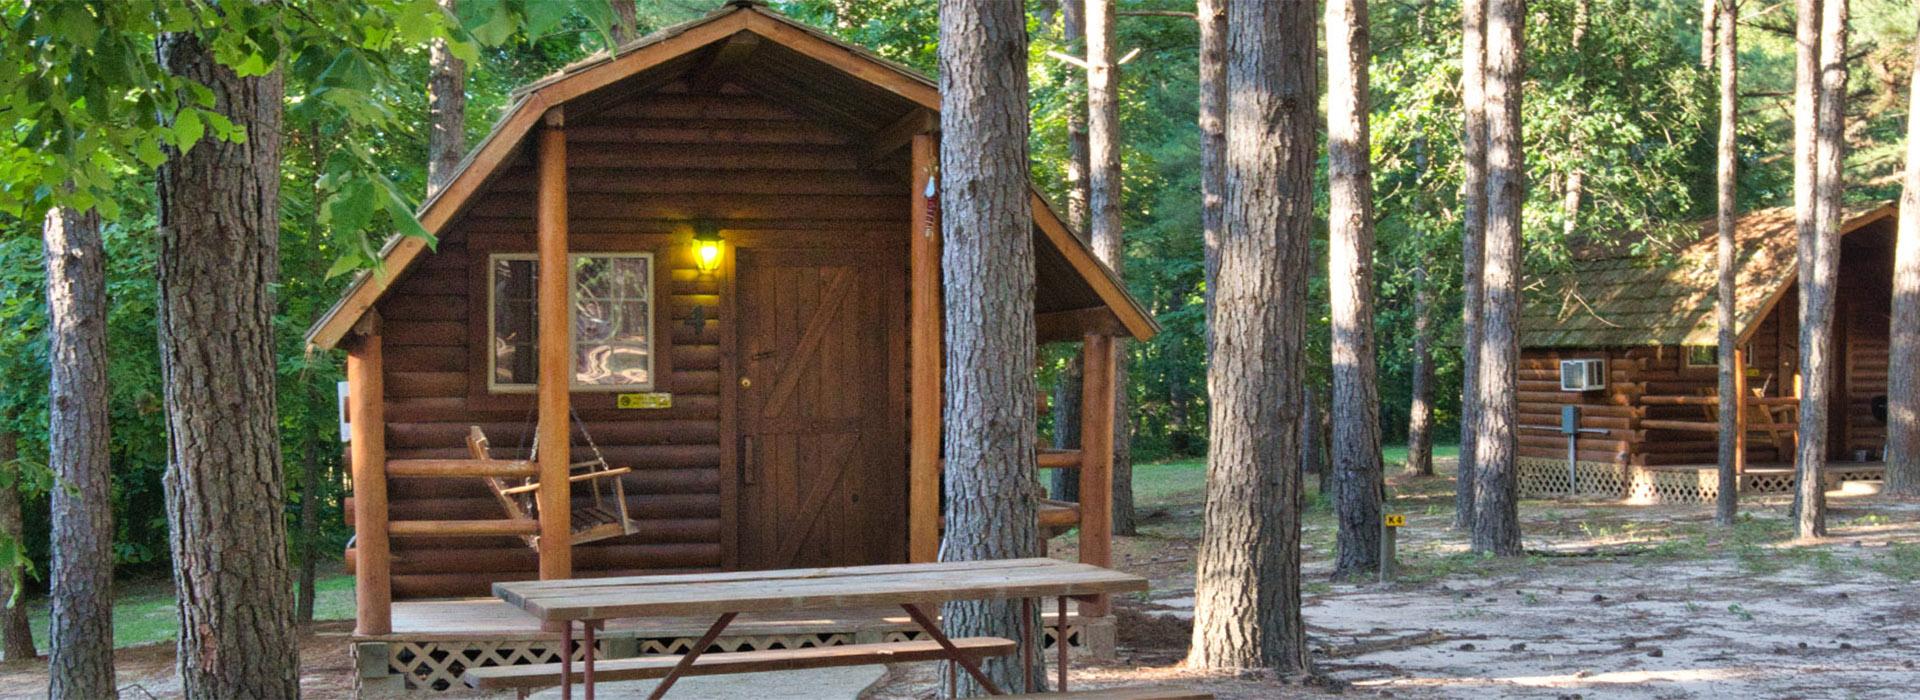 Cabin & TeePee Camping